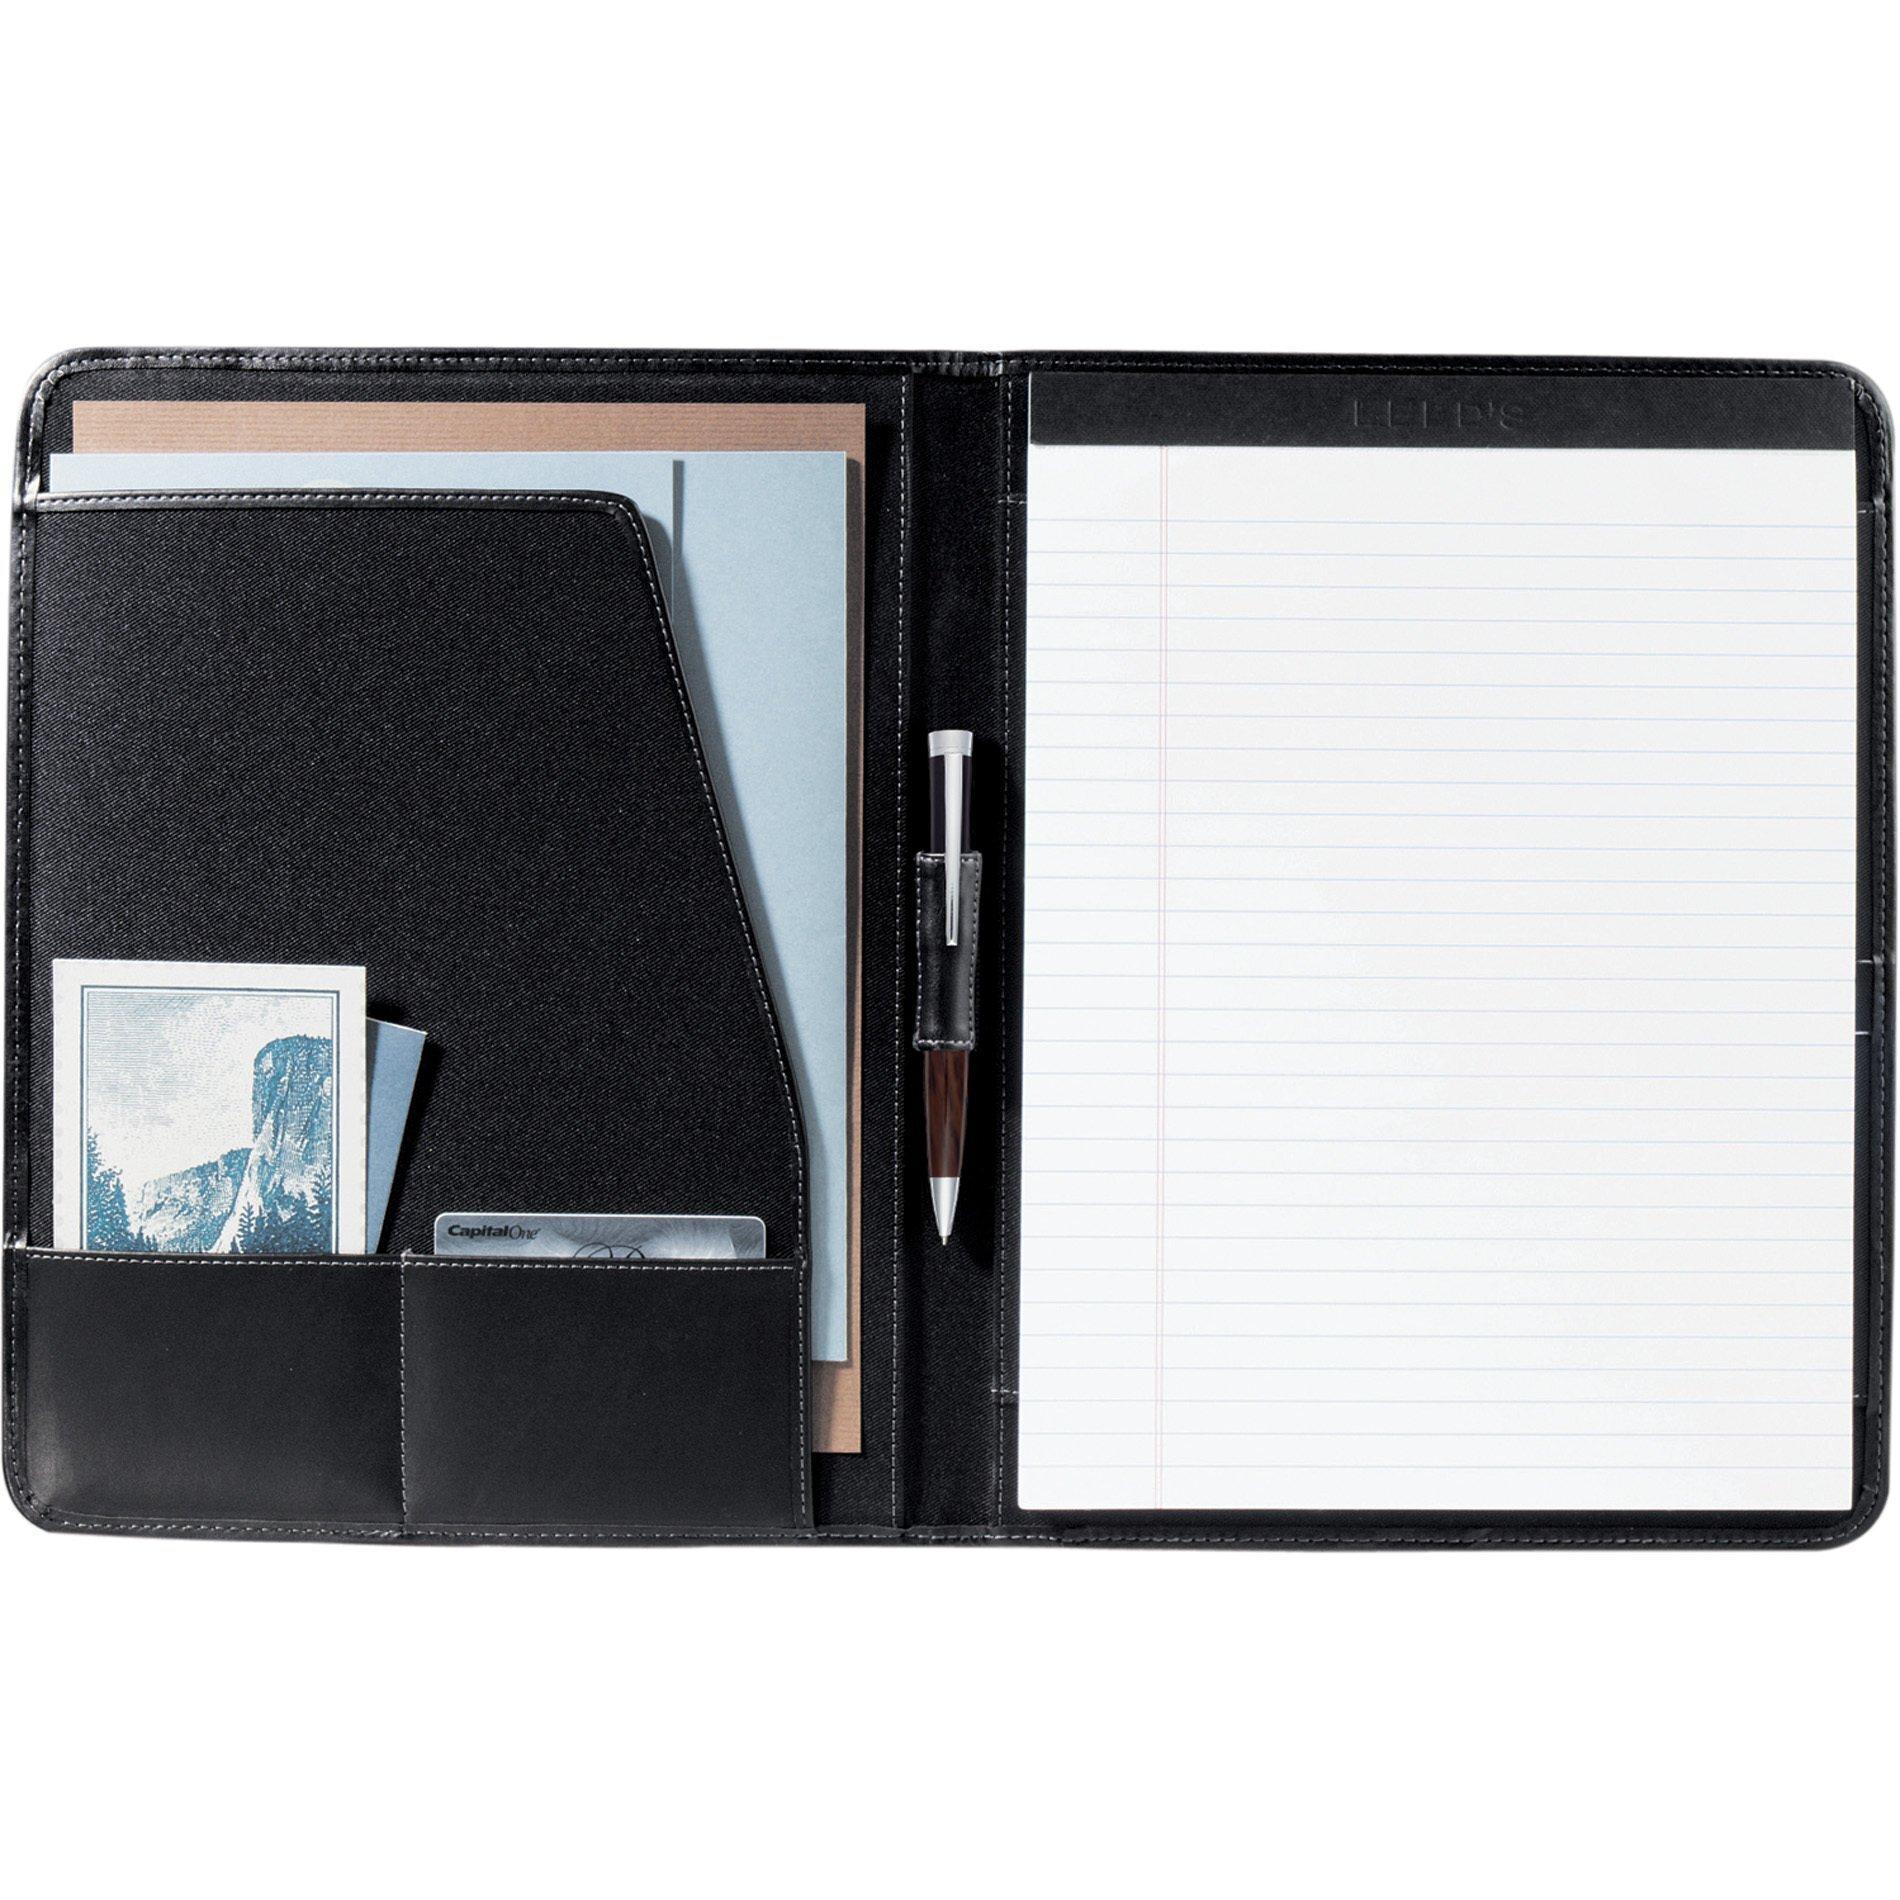 Millenium Leather Writing Pad